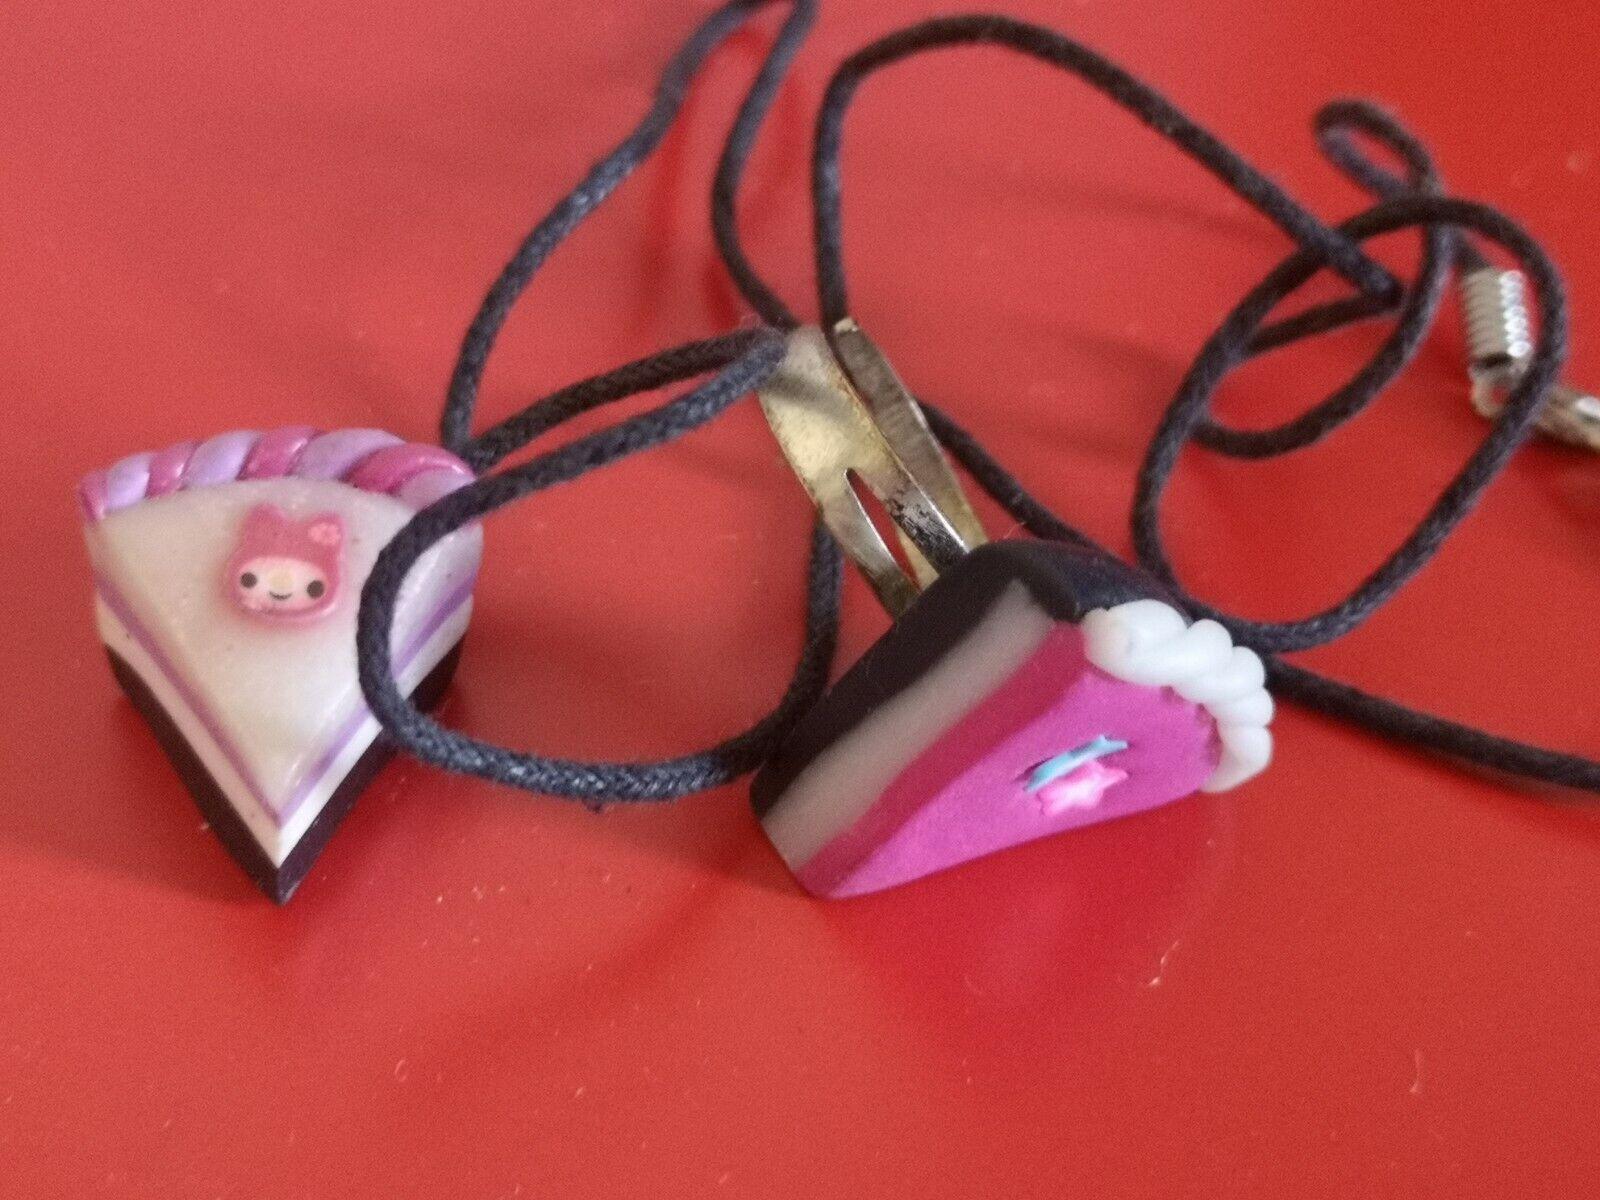 CUTE GIRLY HANDMAFE CAKE NECKLASE AND RING/JEWELLERY /teen gift idea